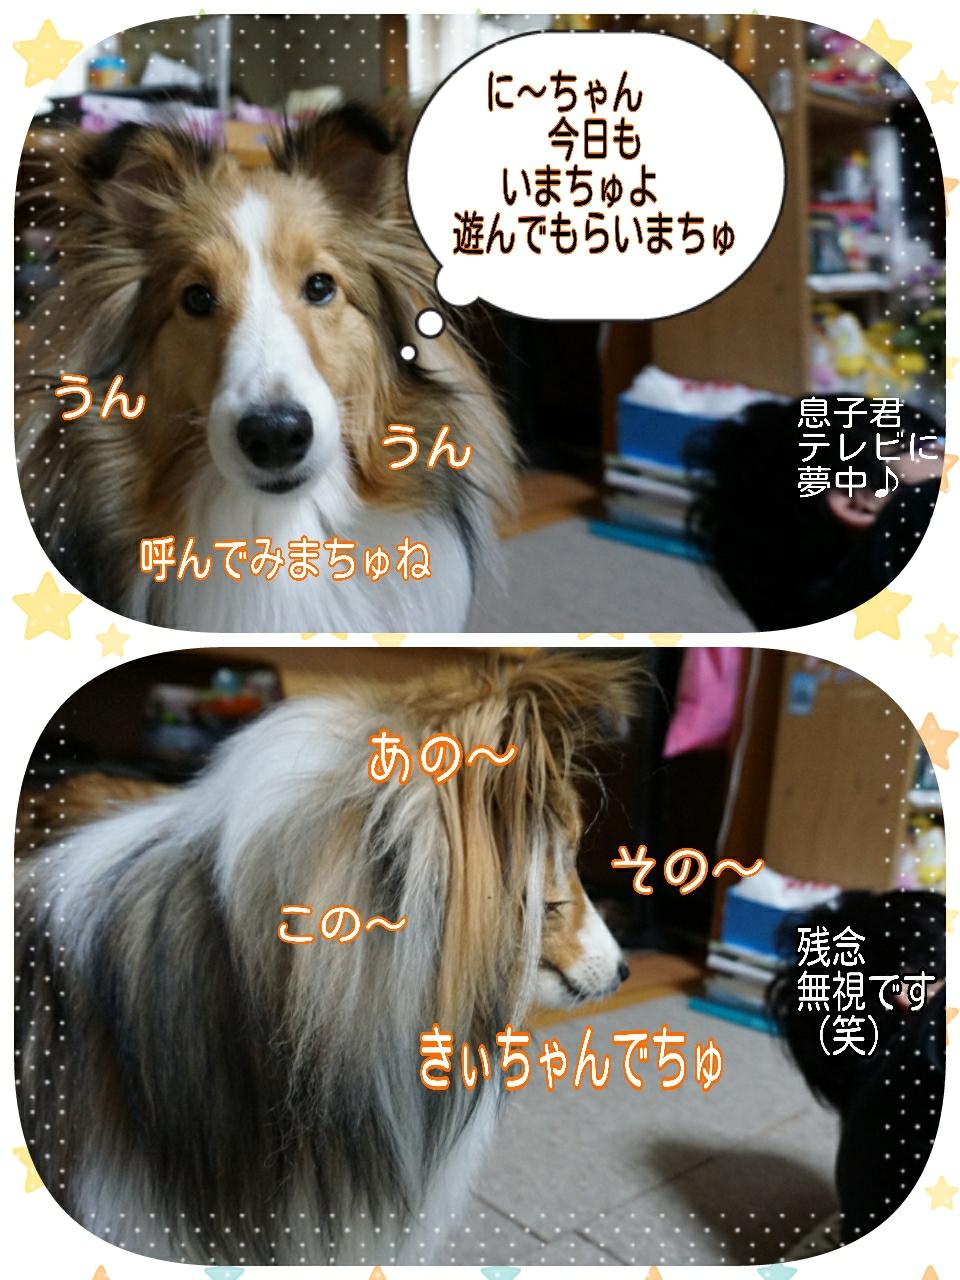 2015-03-04-00-17-39_deco.jpg